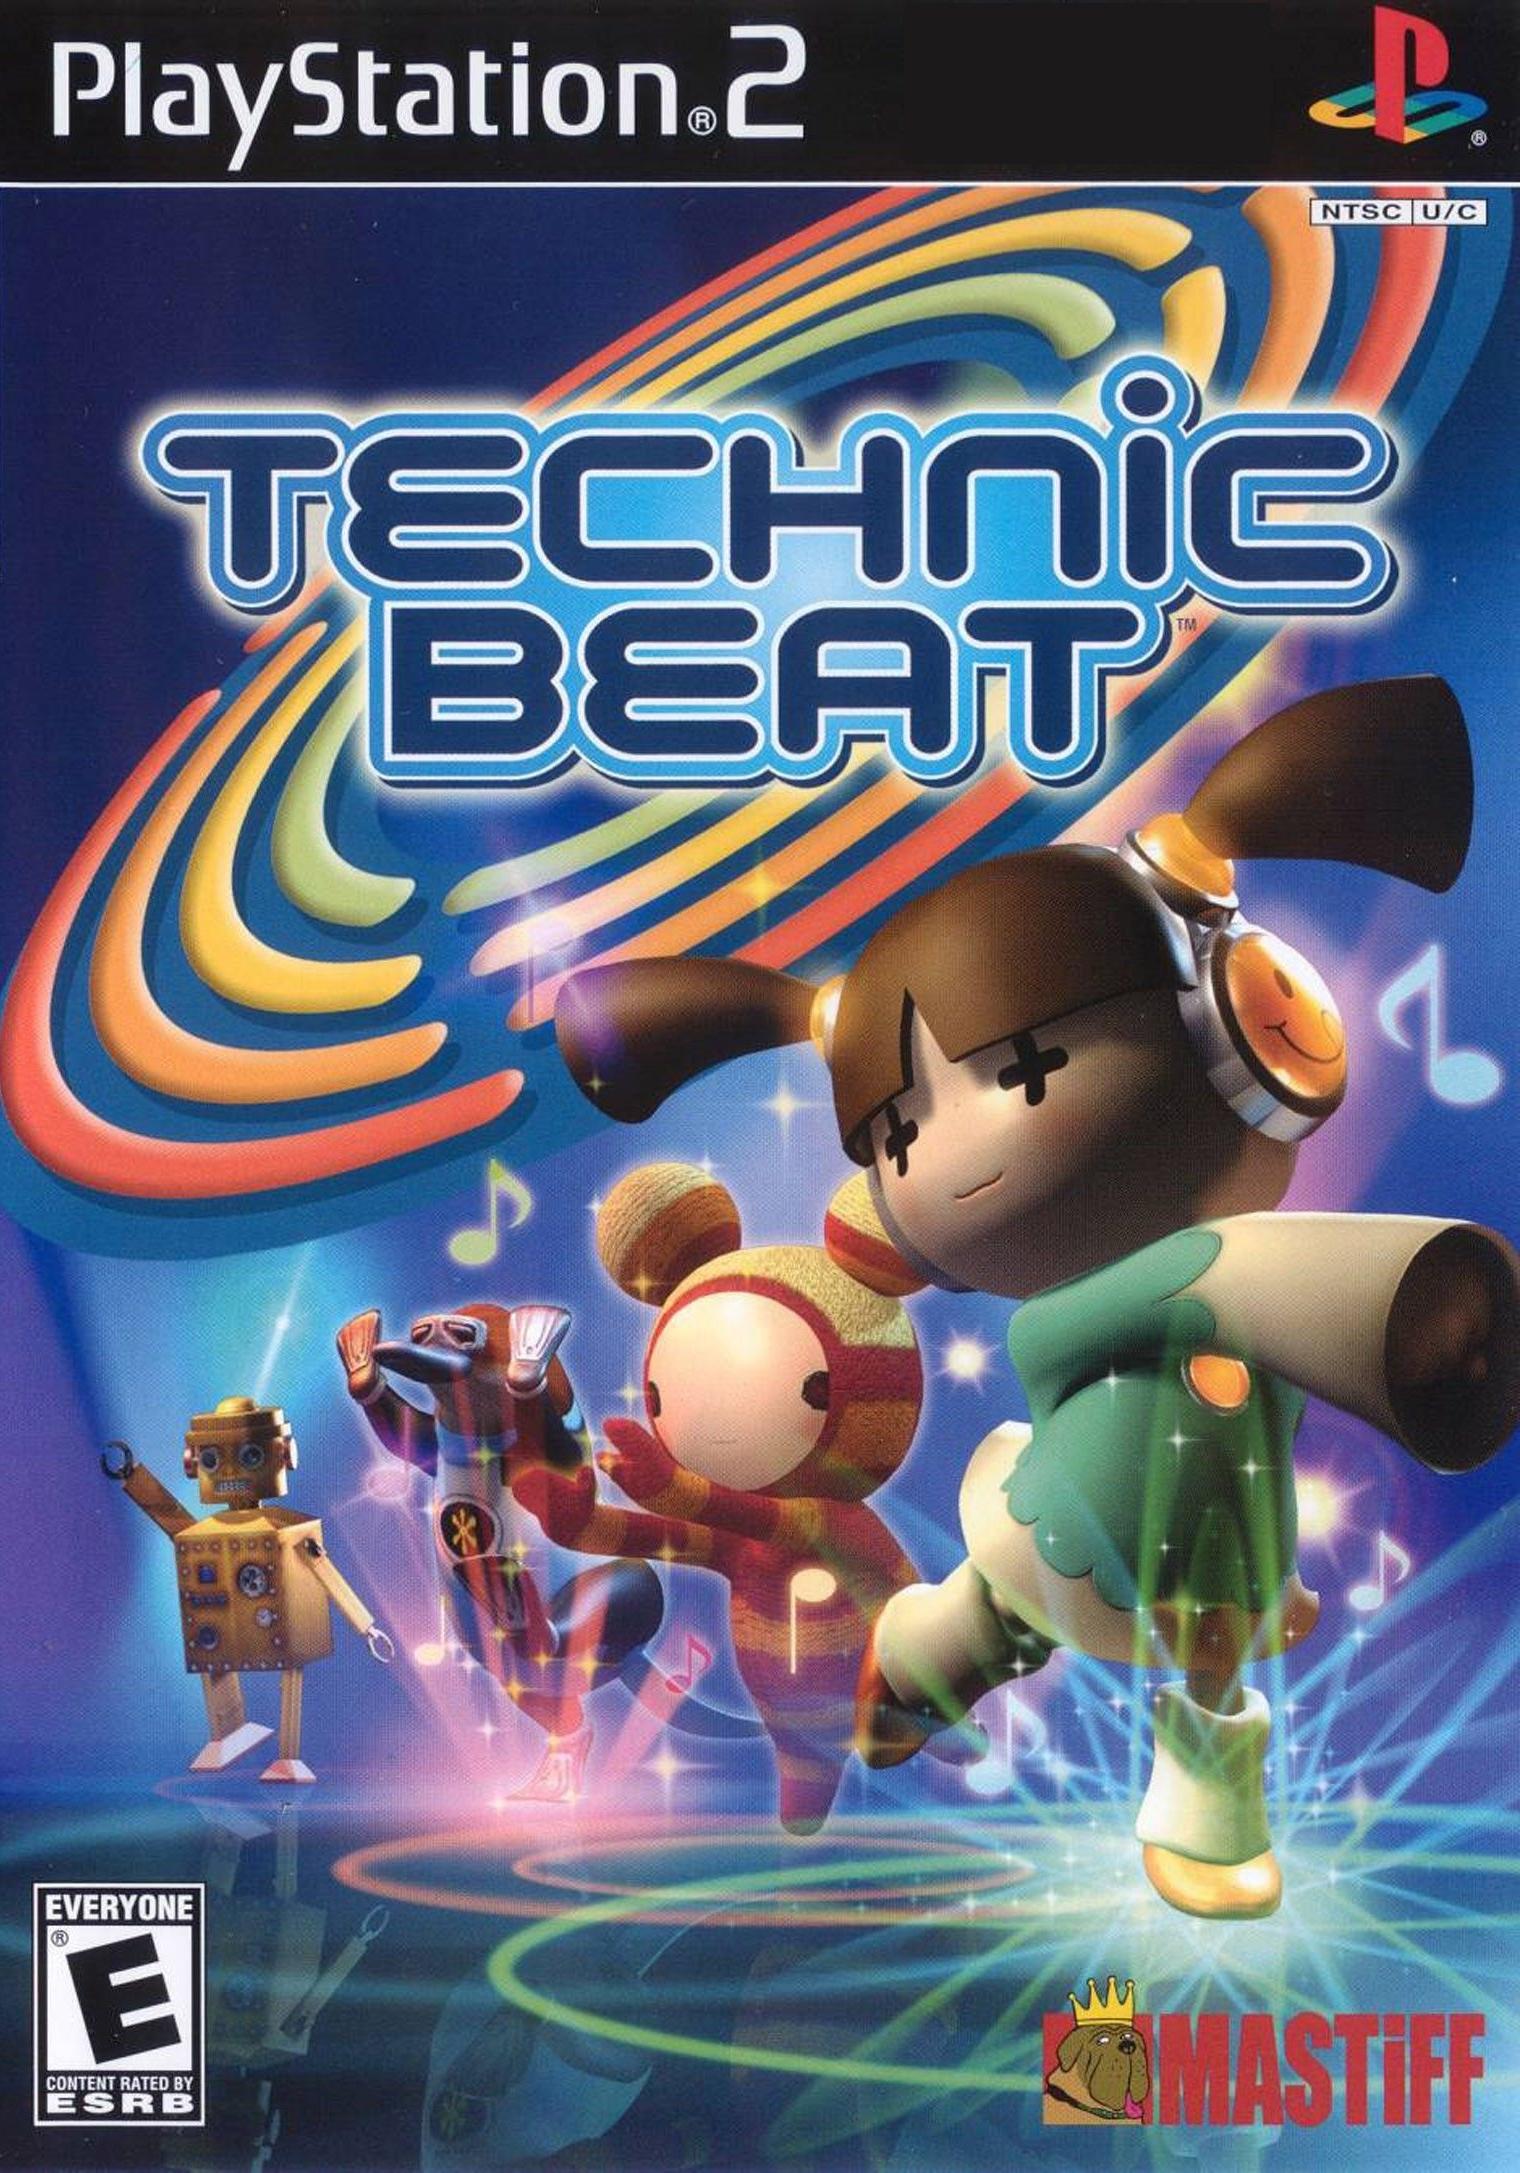 Technicbeat Cover